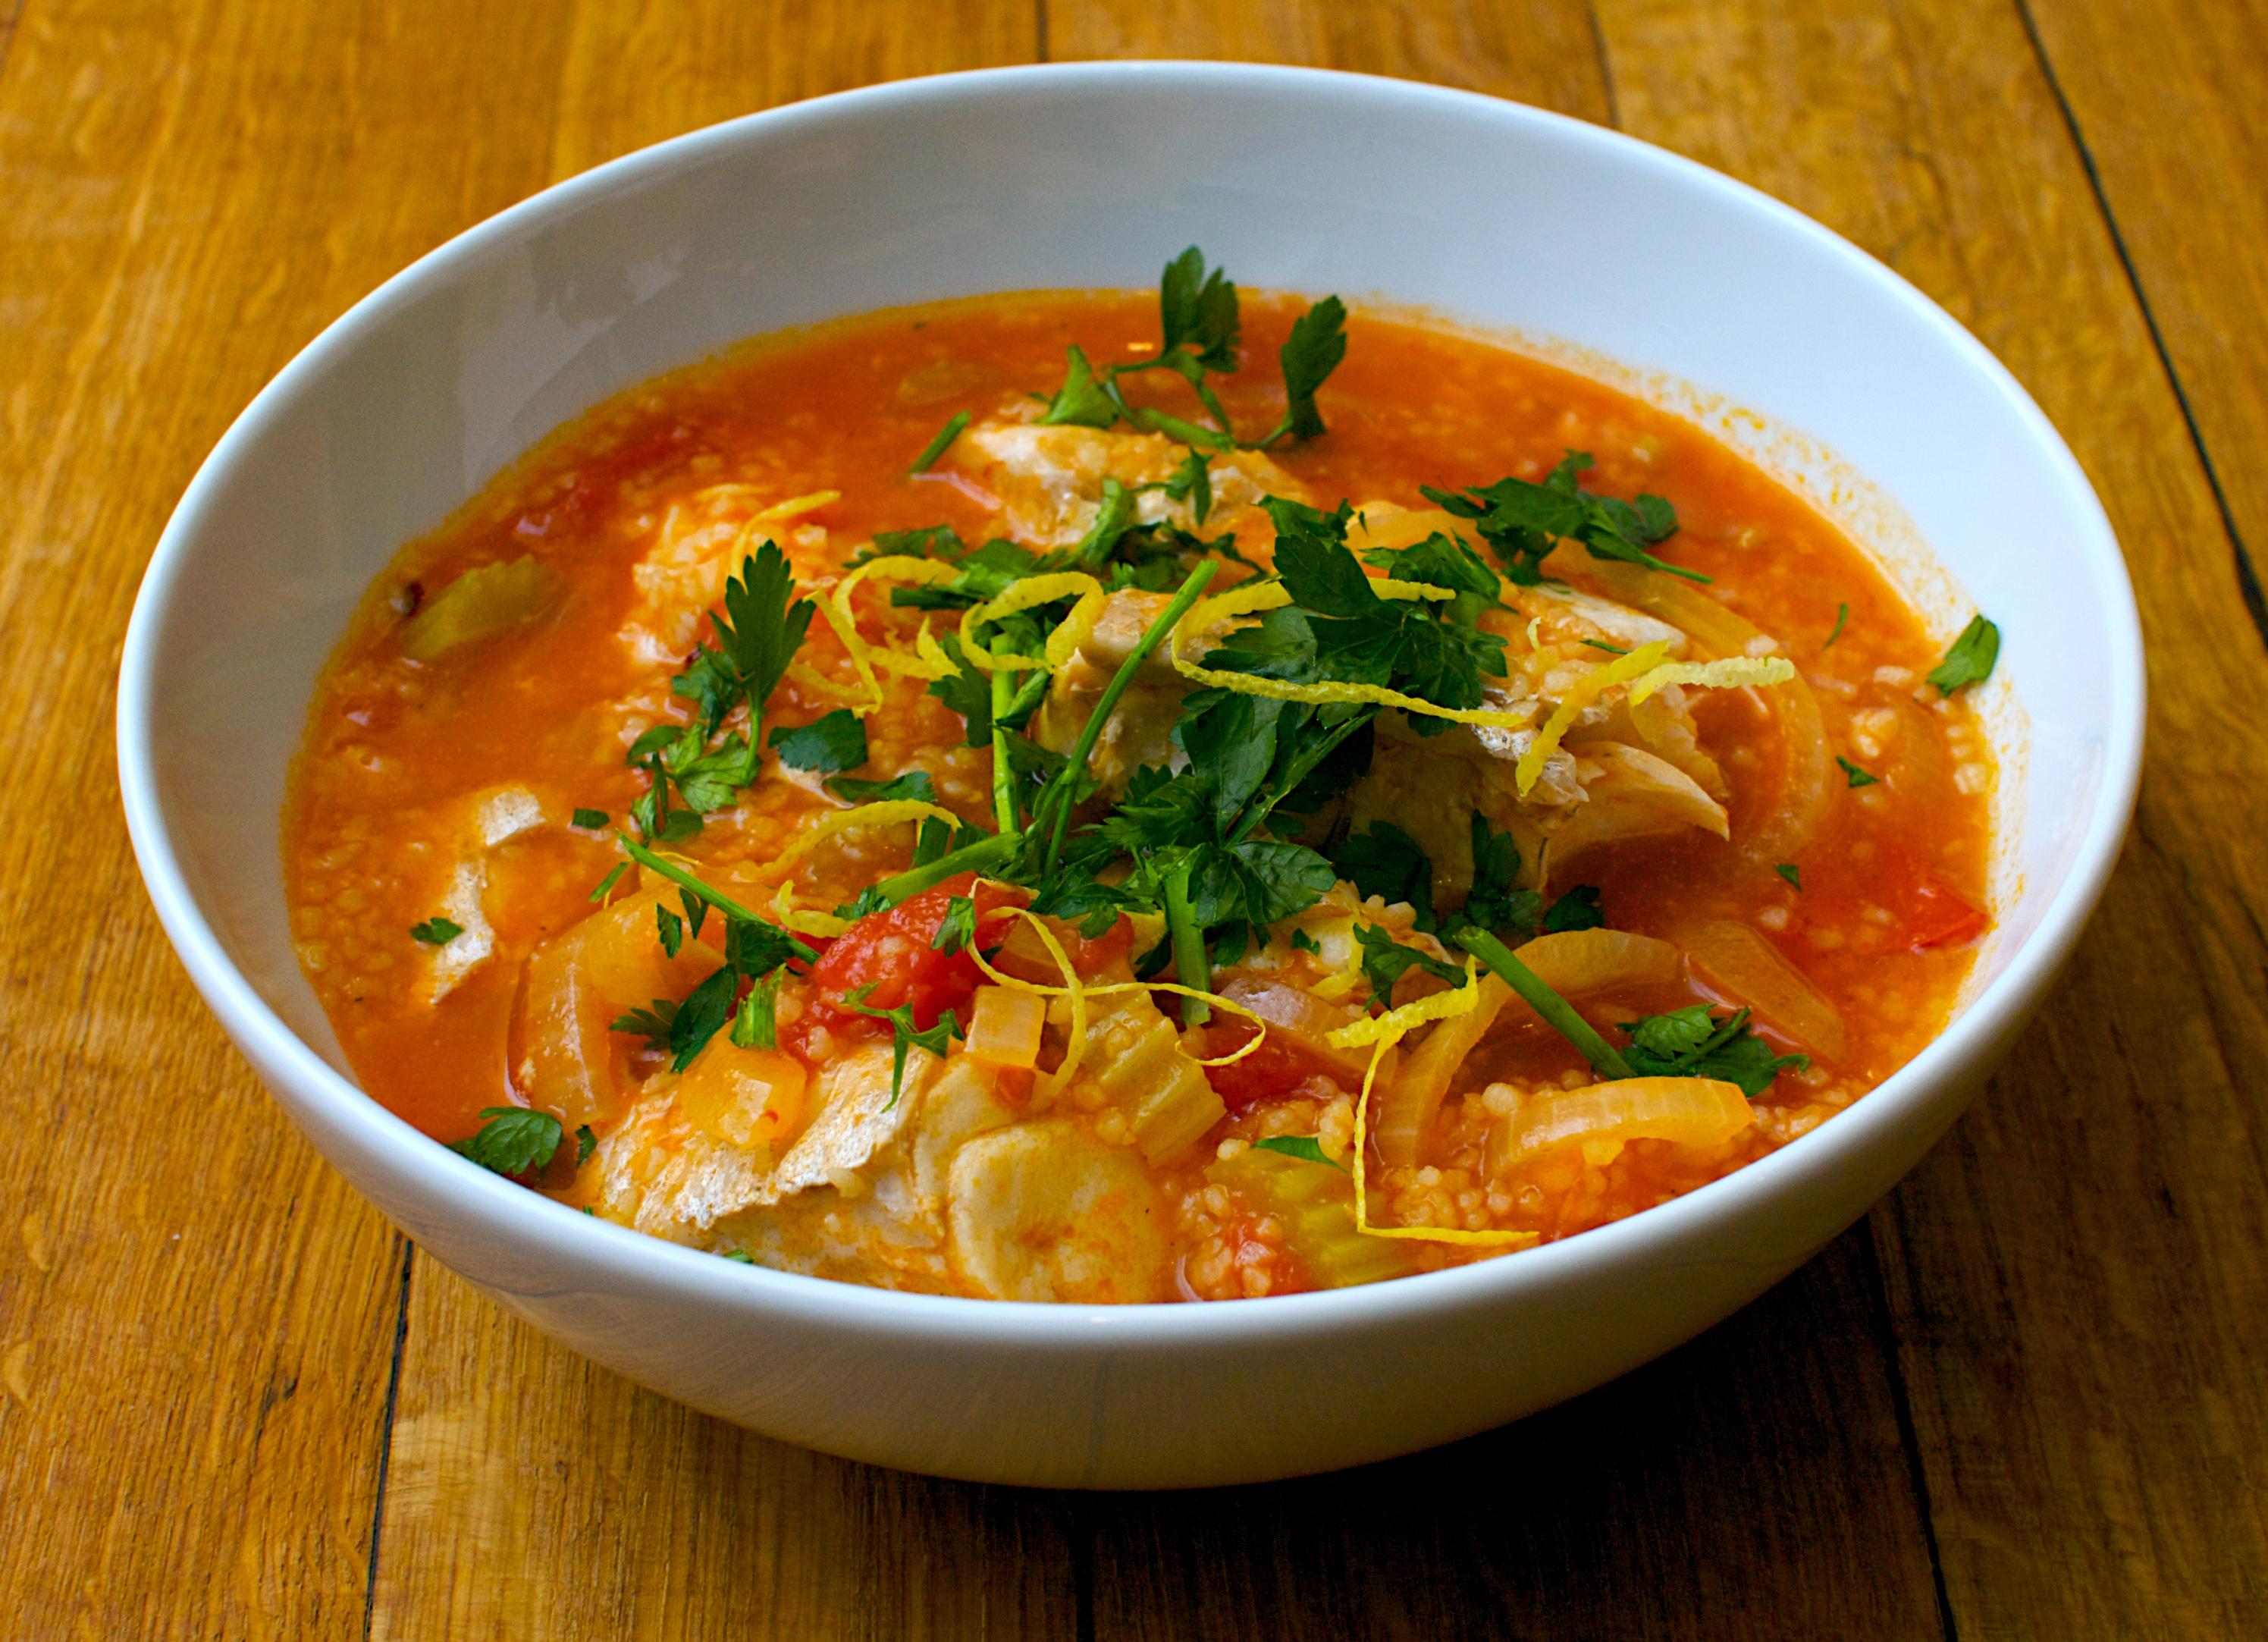 Sicilian style fish stew jono jules do food wine for Fish broth recipe